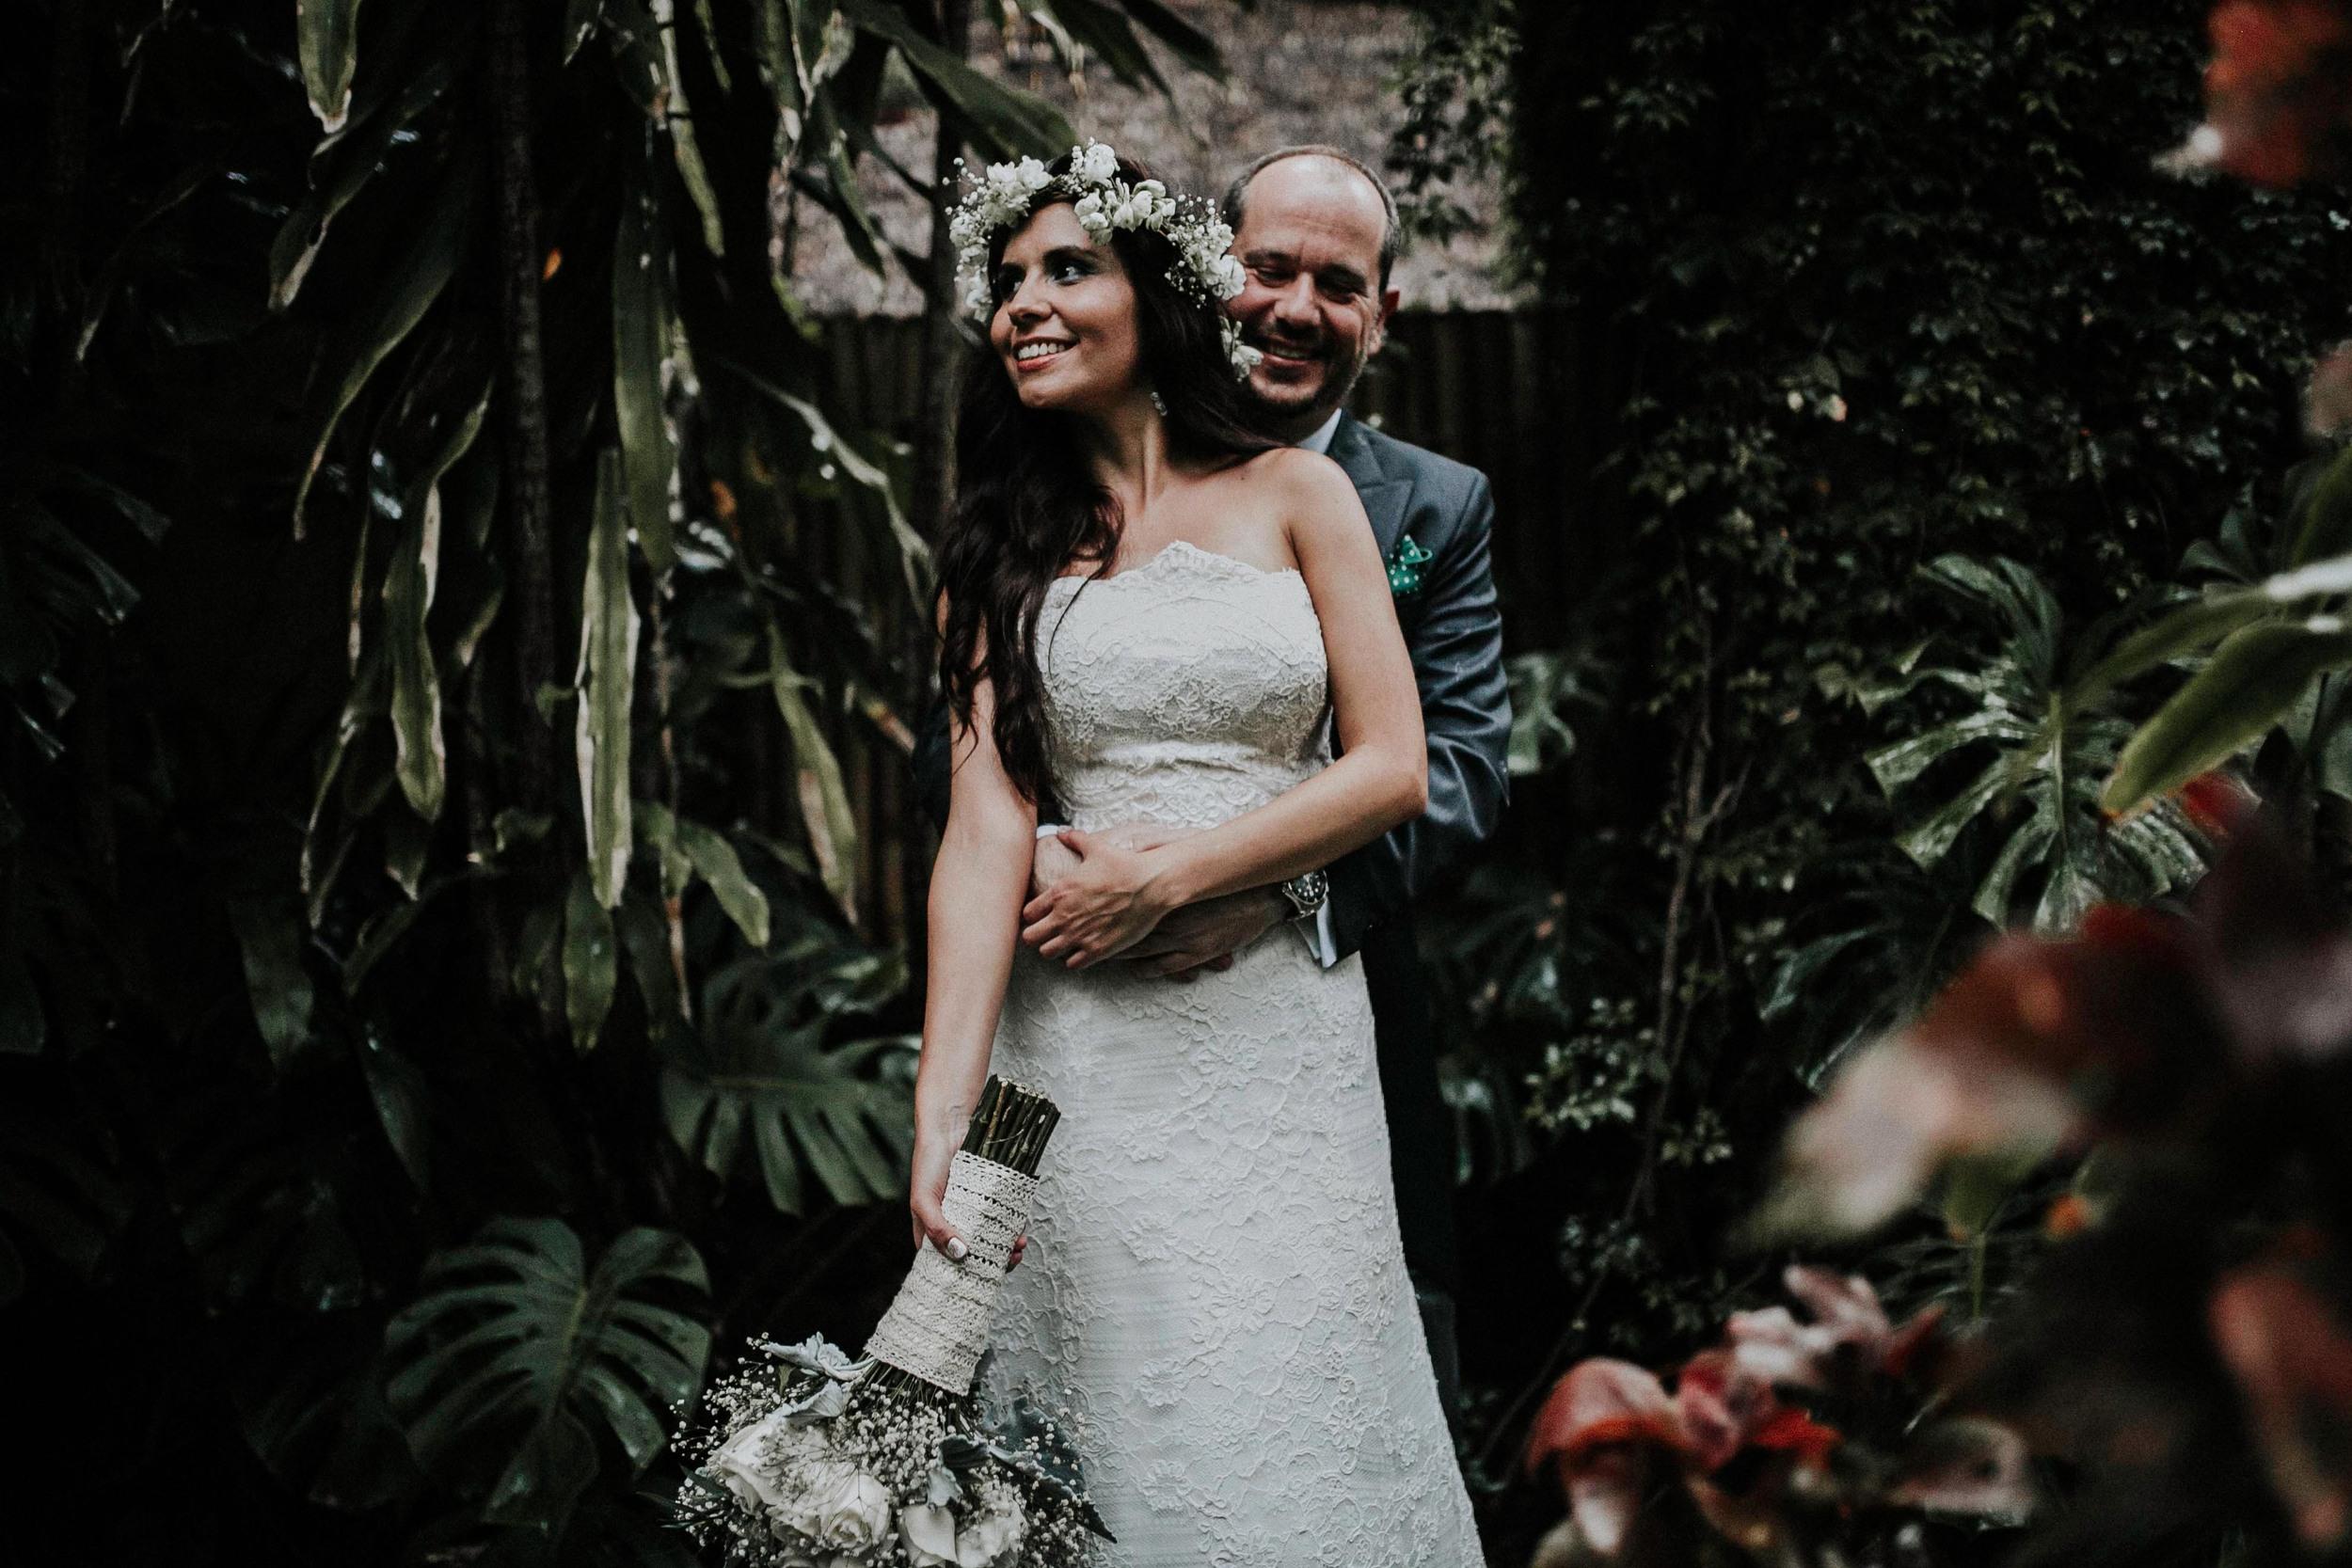 643A2344-Editar-2alfonso_flores_destination_wedding_photographer_San_gabriel_de_las_palmas.jpg